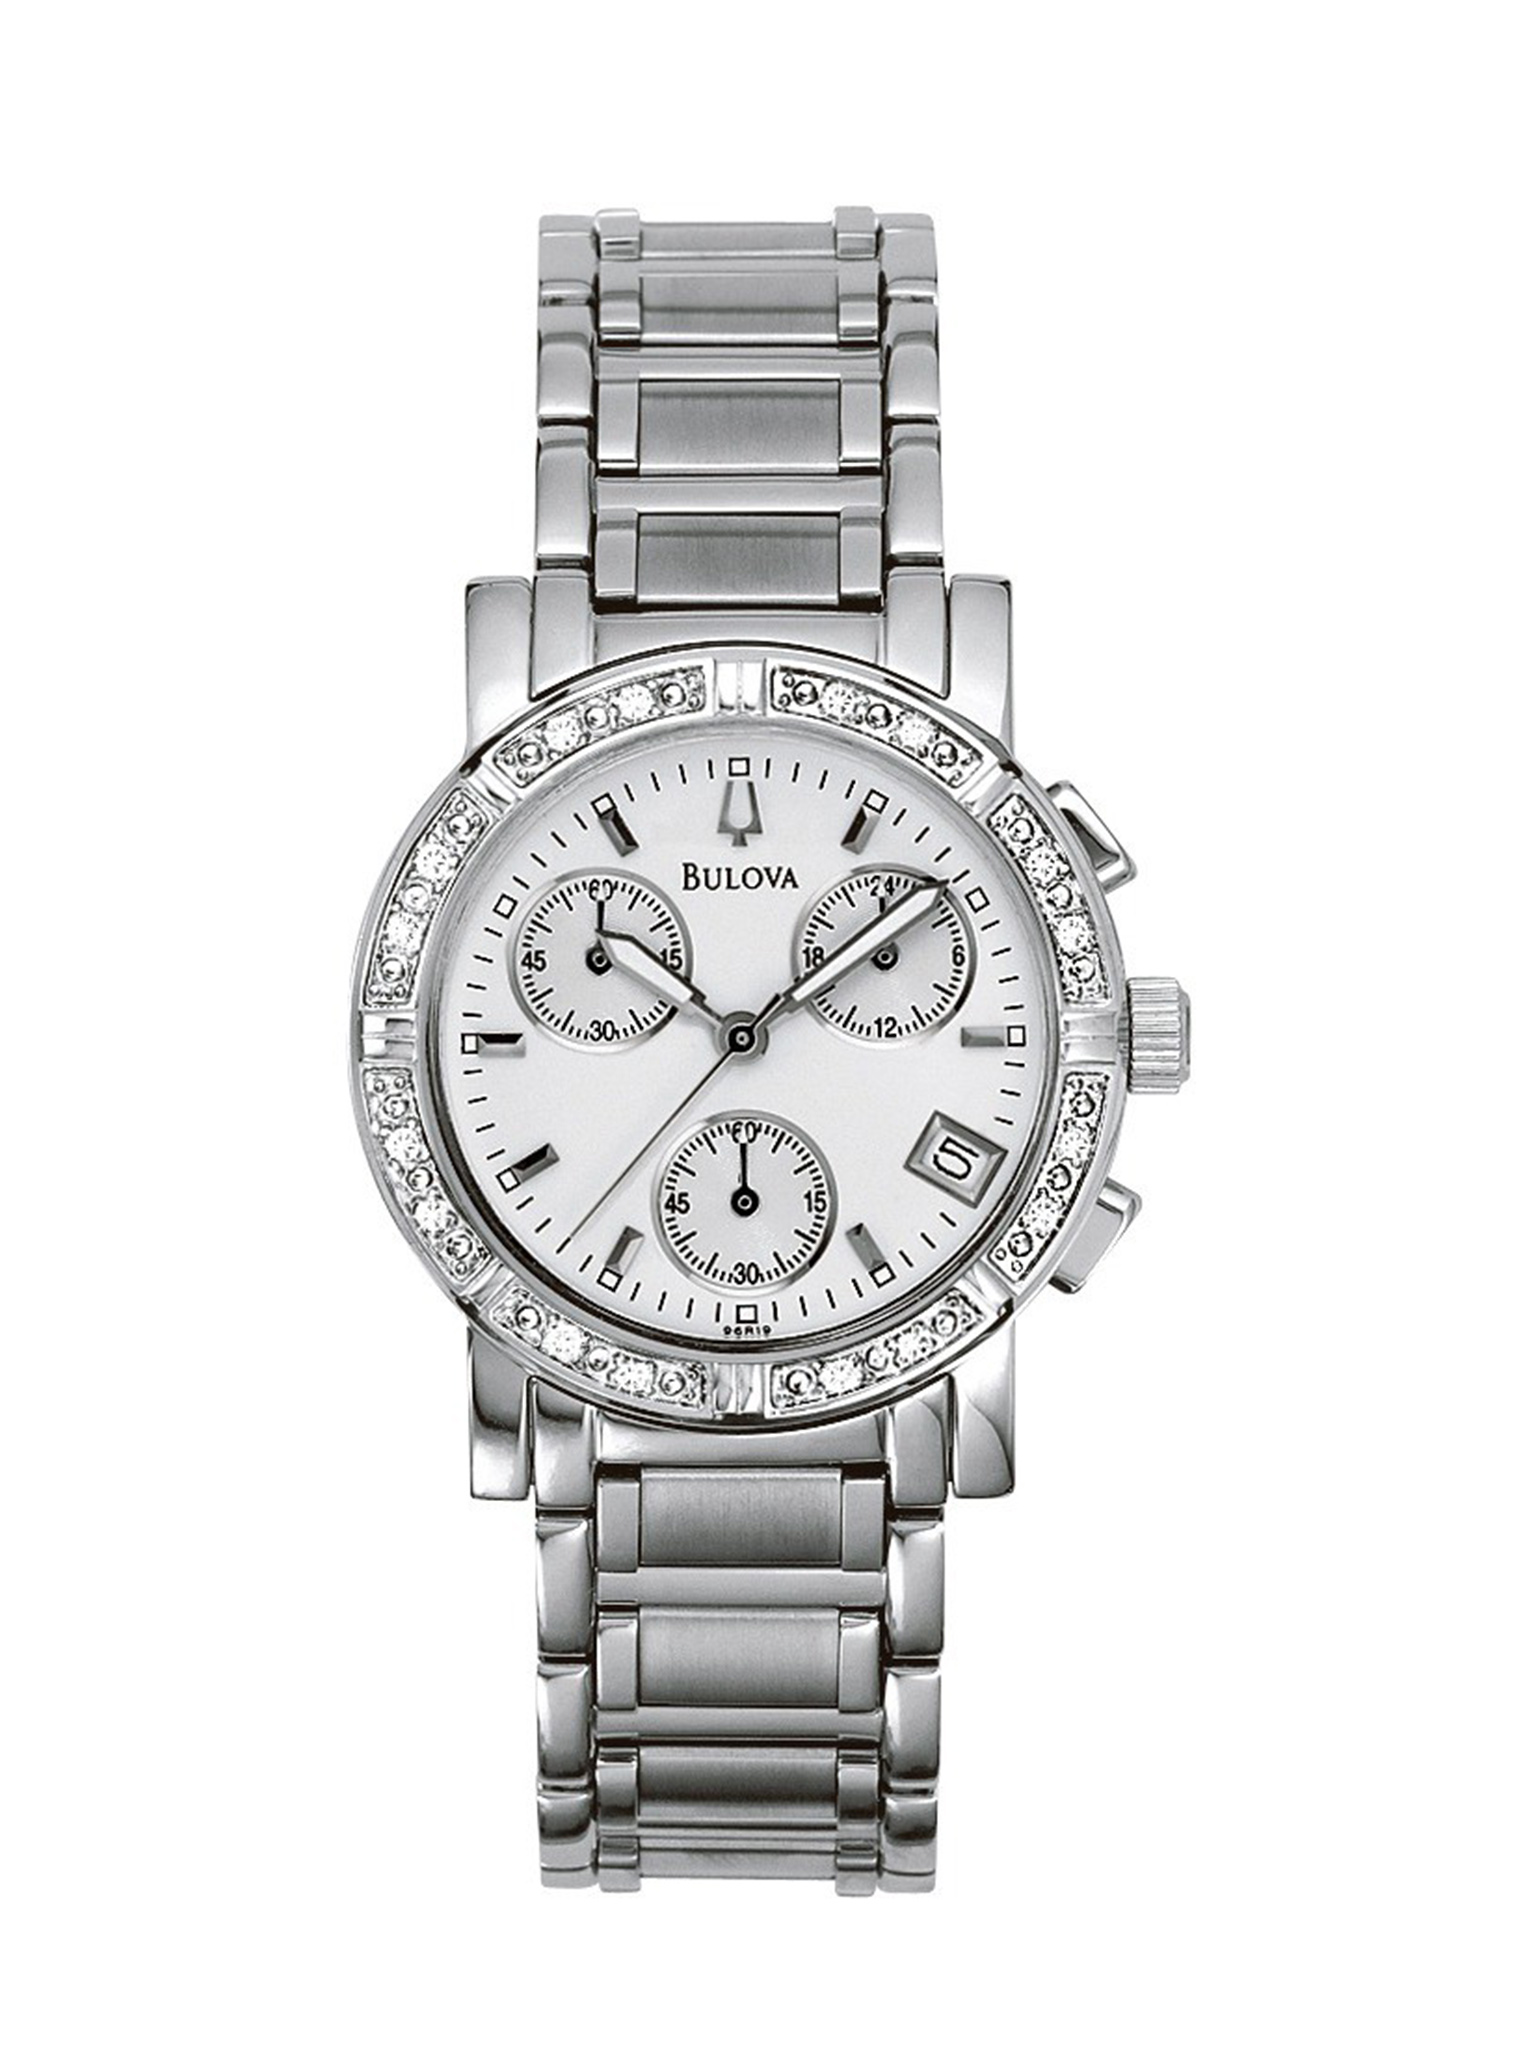 womens-bulova-chronograph-watch-96R19.jpg